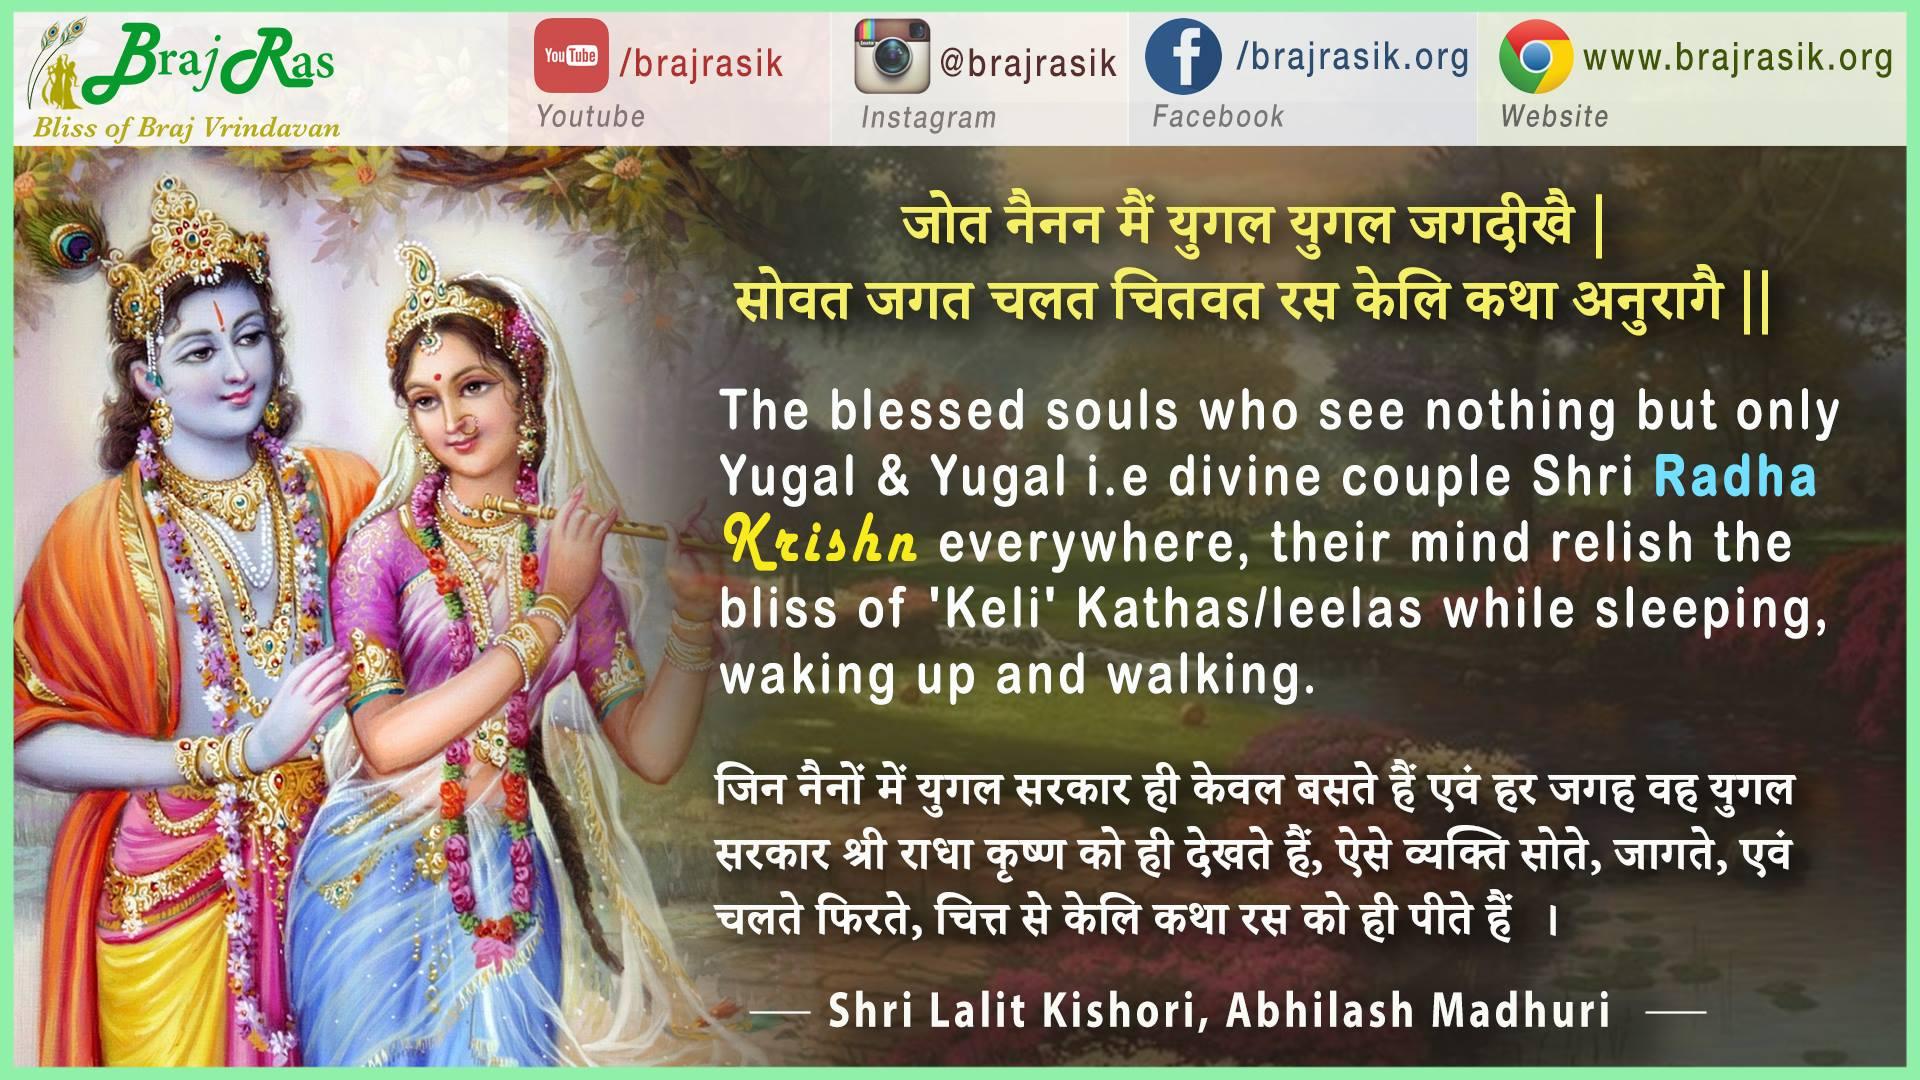 Jota Nainan Mein Yugal Yugal Jag Dikhe - Shri Lalit Kishori, Abhilash Madhuri